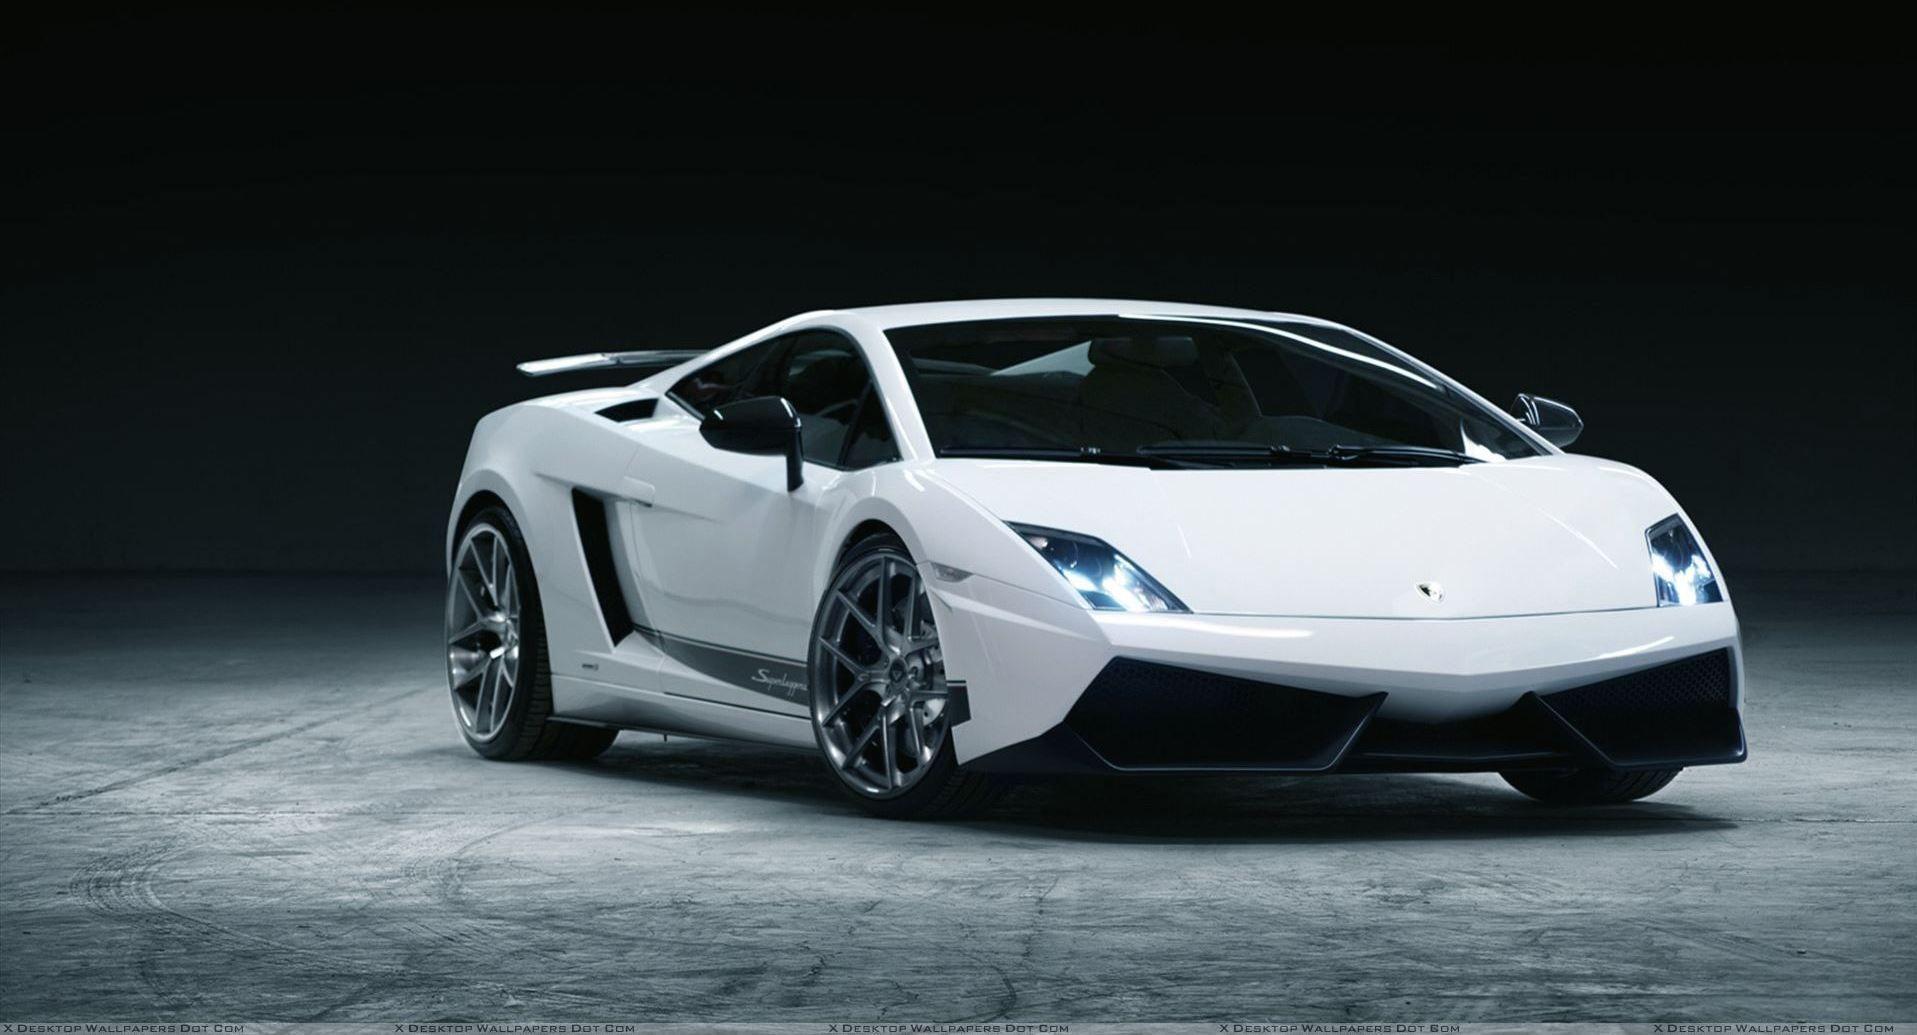 Lamborghini Gallardo Hd Iphone Plus Wallpaper I Love